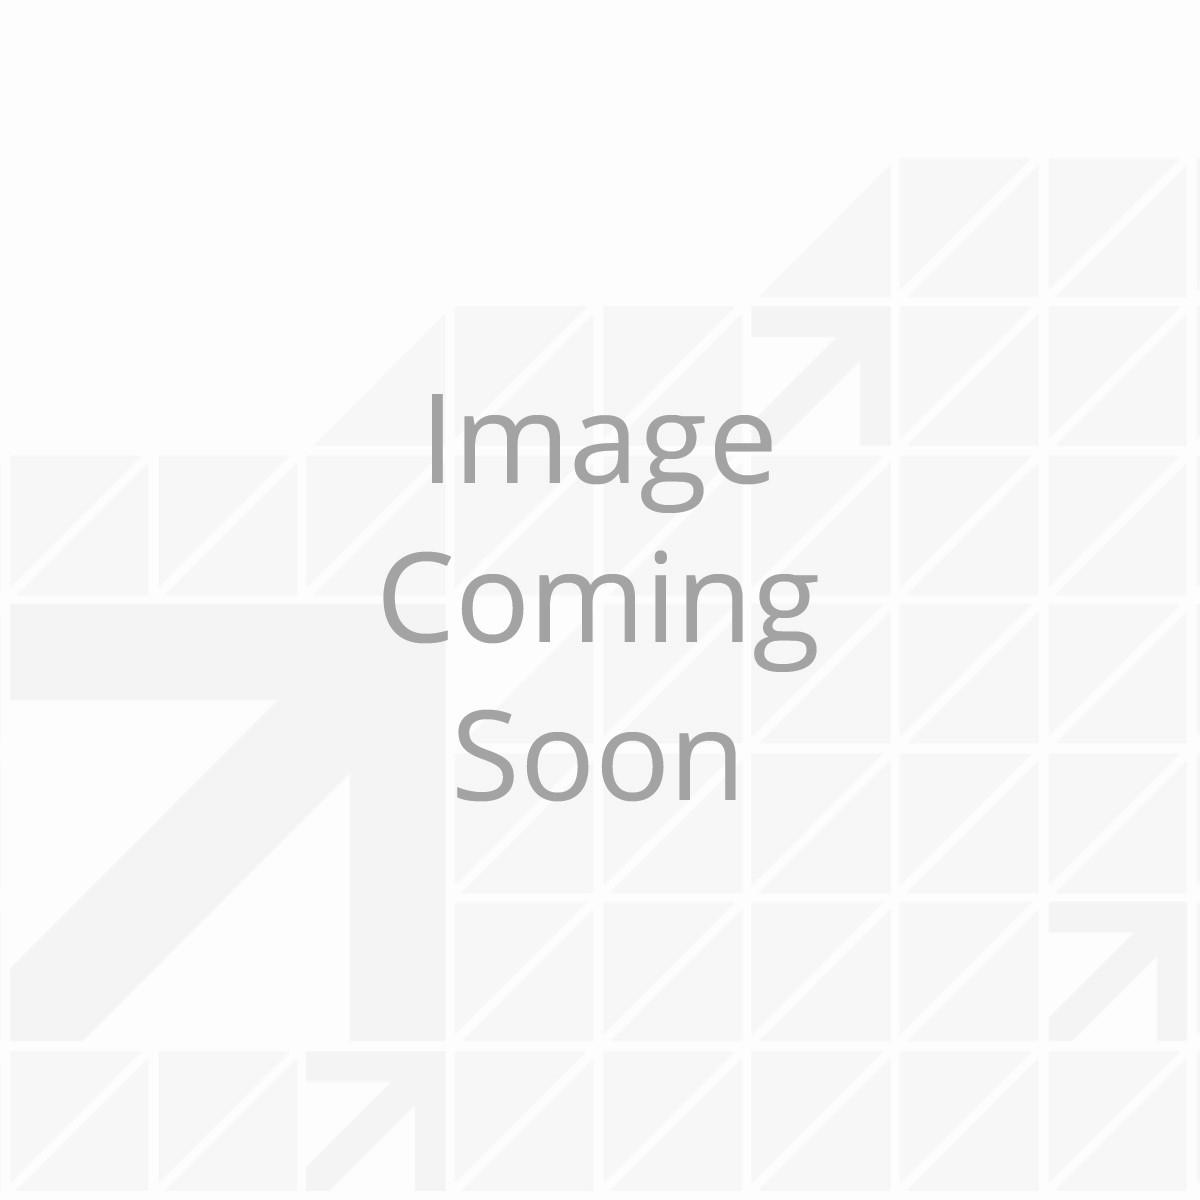 Hydraulic Power Unit With 2QT Pump Reservoir Kit Model 643150